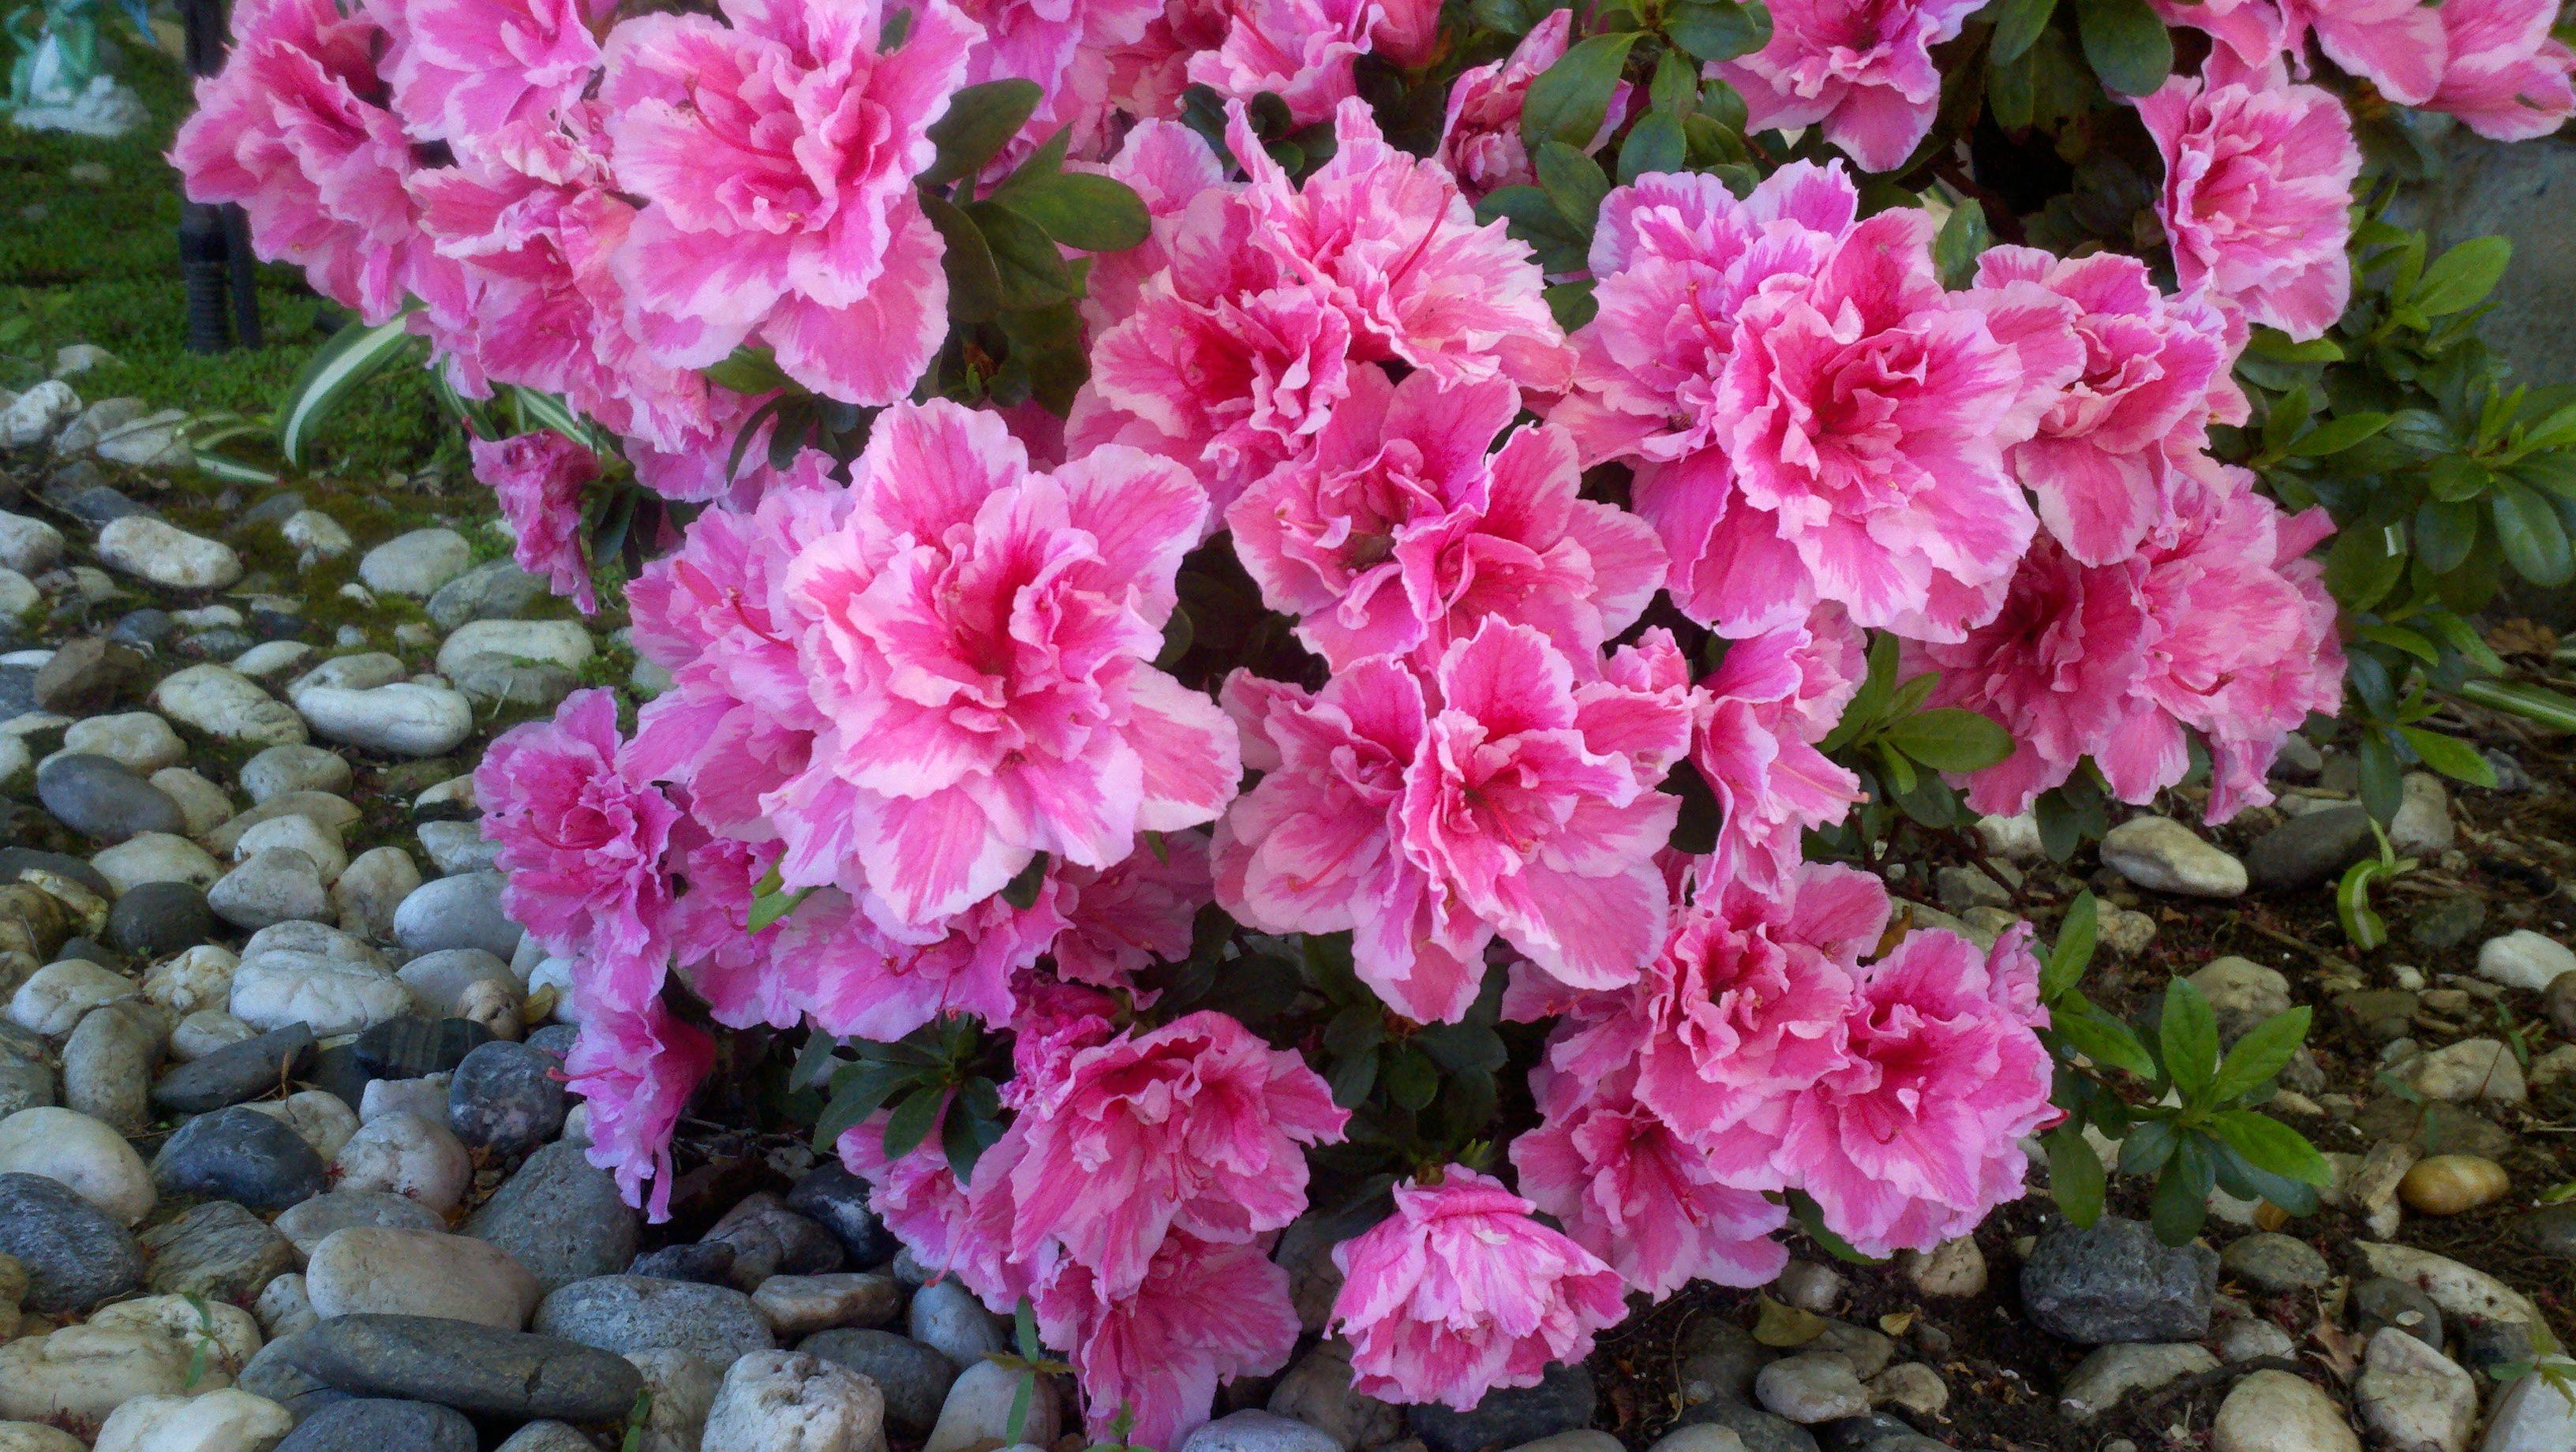 Pinstriped Edge Pink Azalea Flower Garden Gardening Flowers